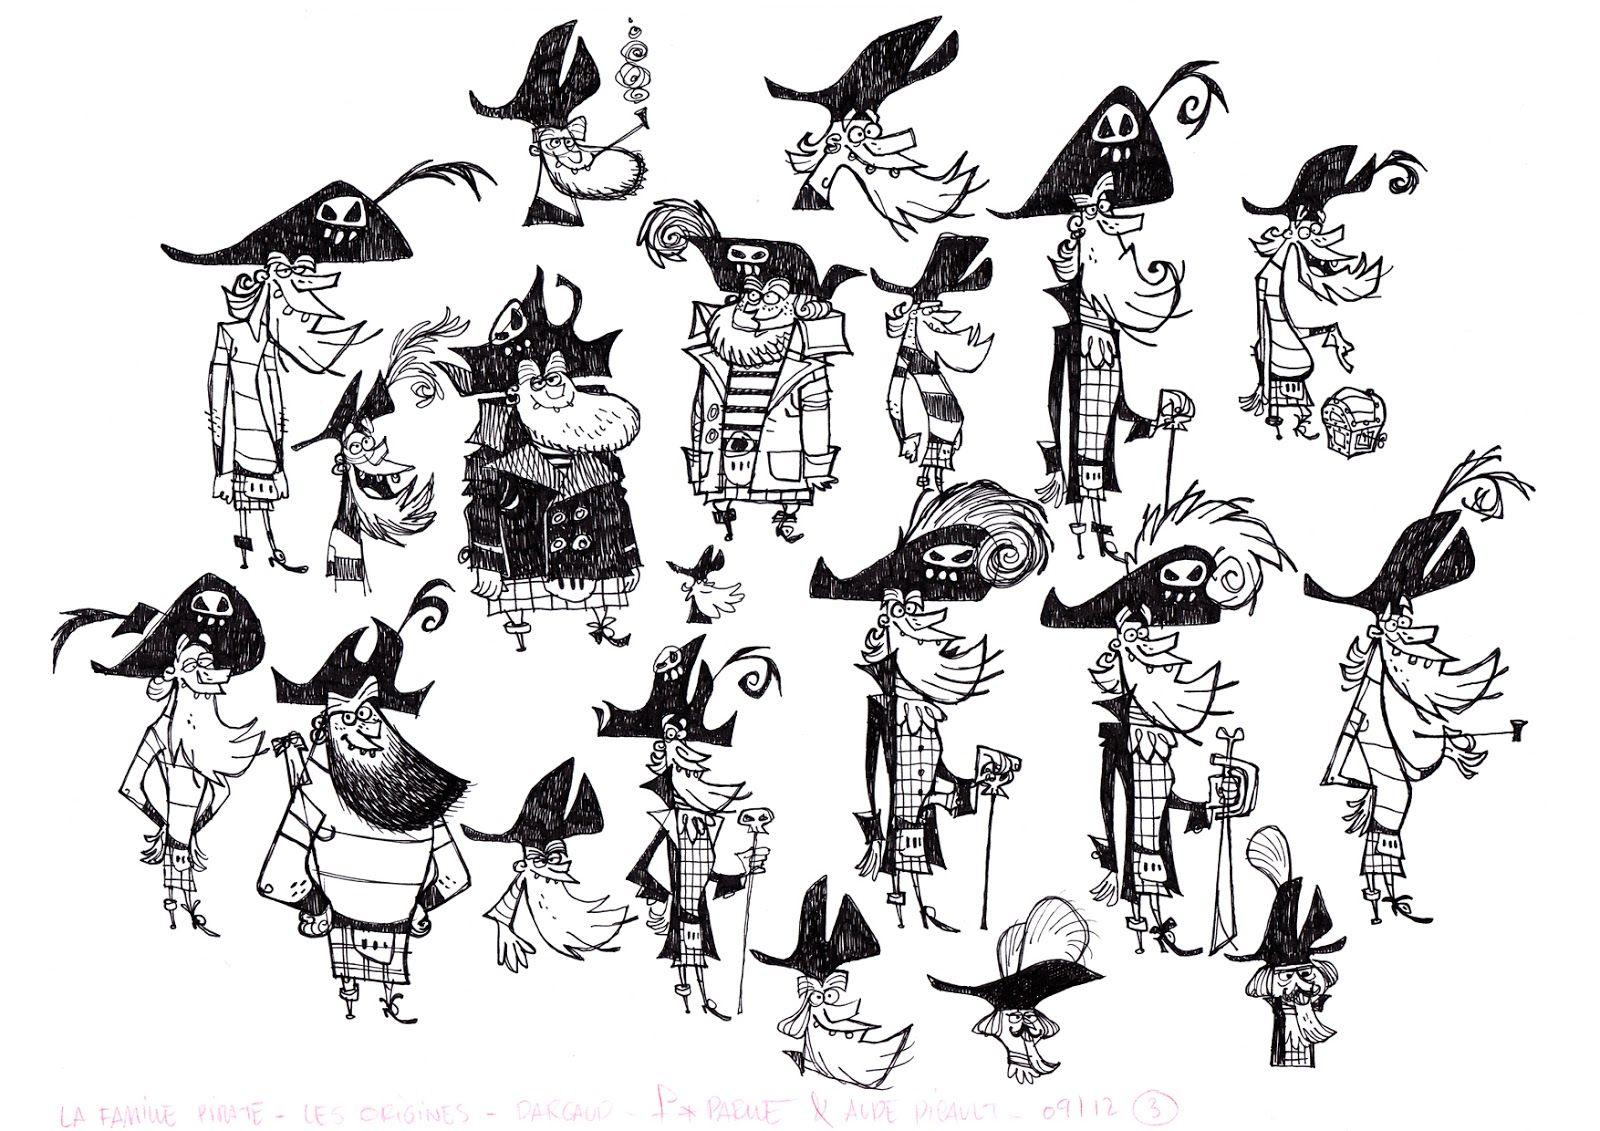 Fabrice parme la famille pirate pinterest parme - Dessin anime de la famille pirate ...